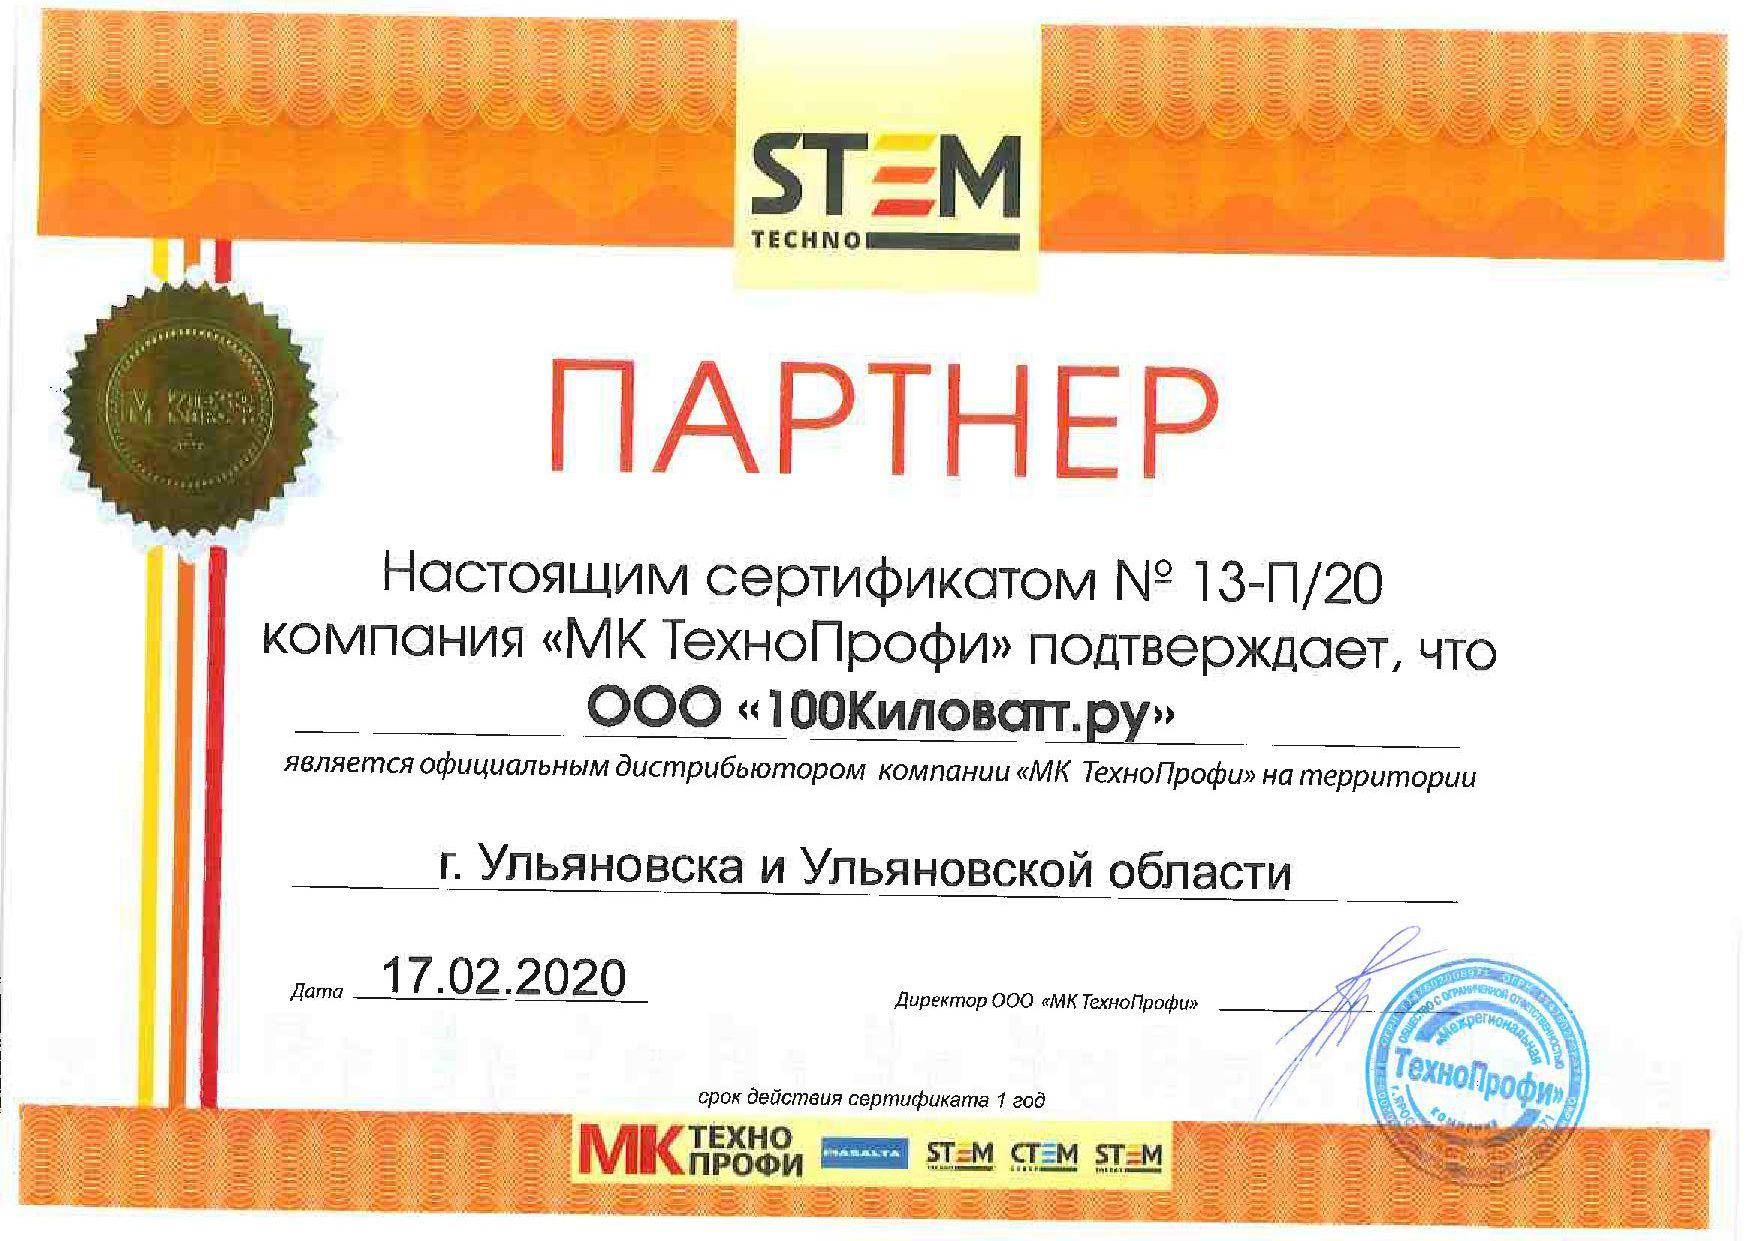 STEM - Сертификат дилера